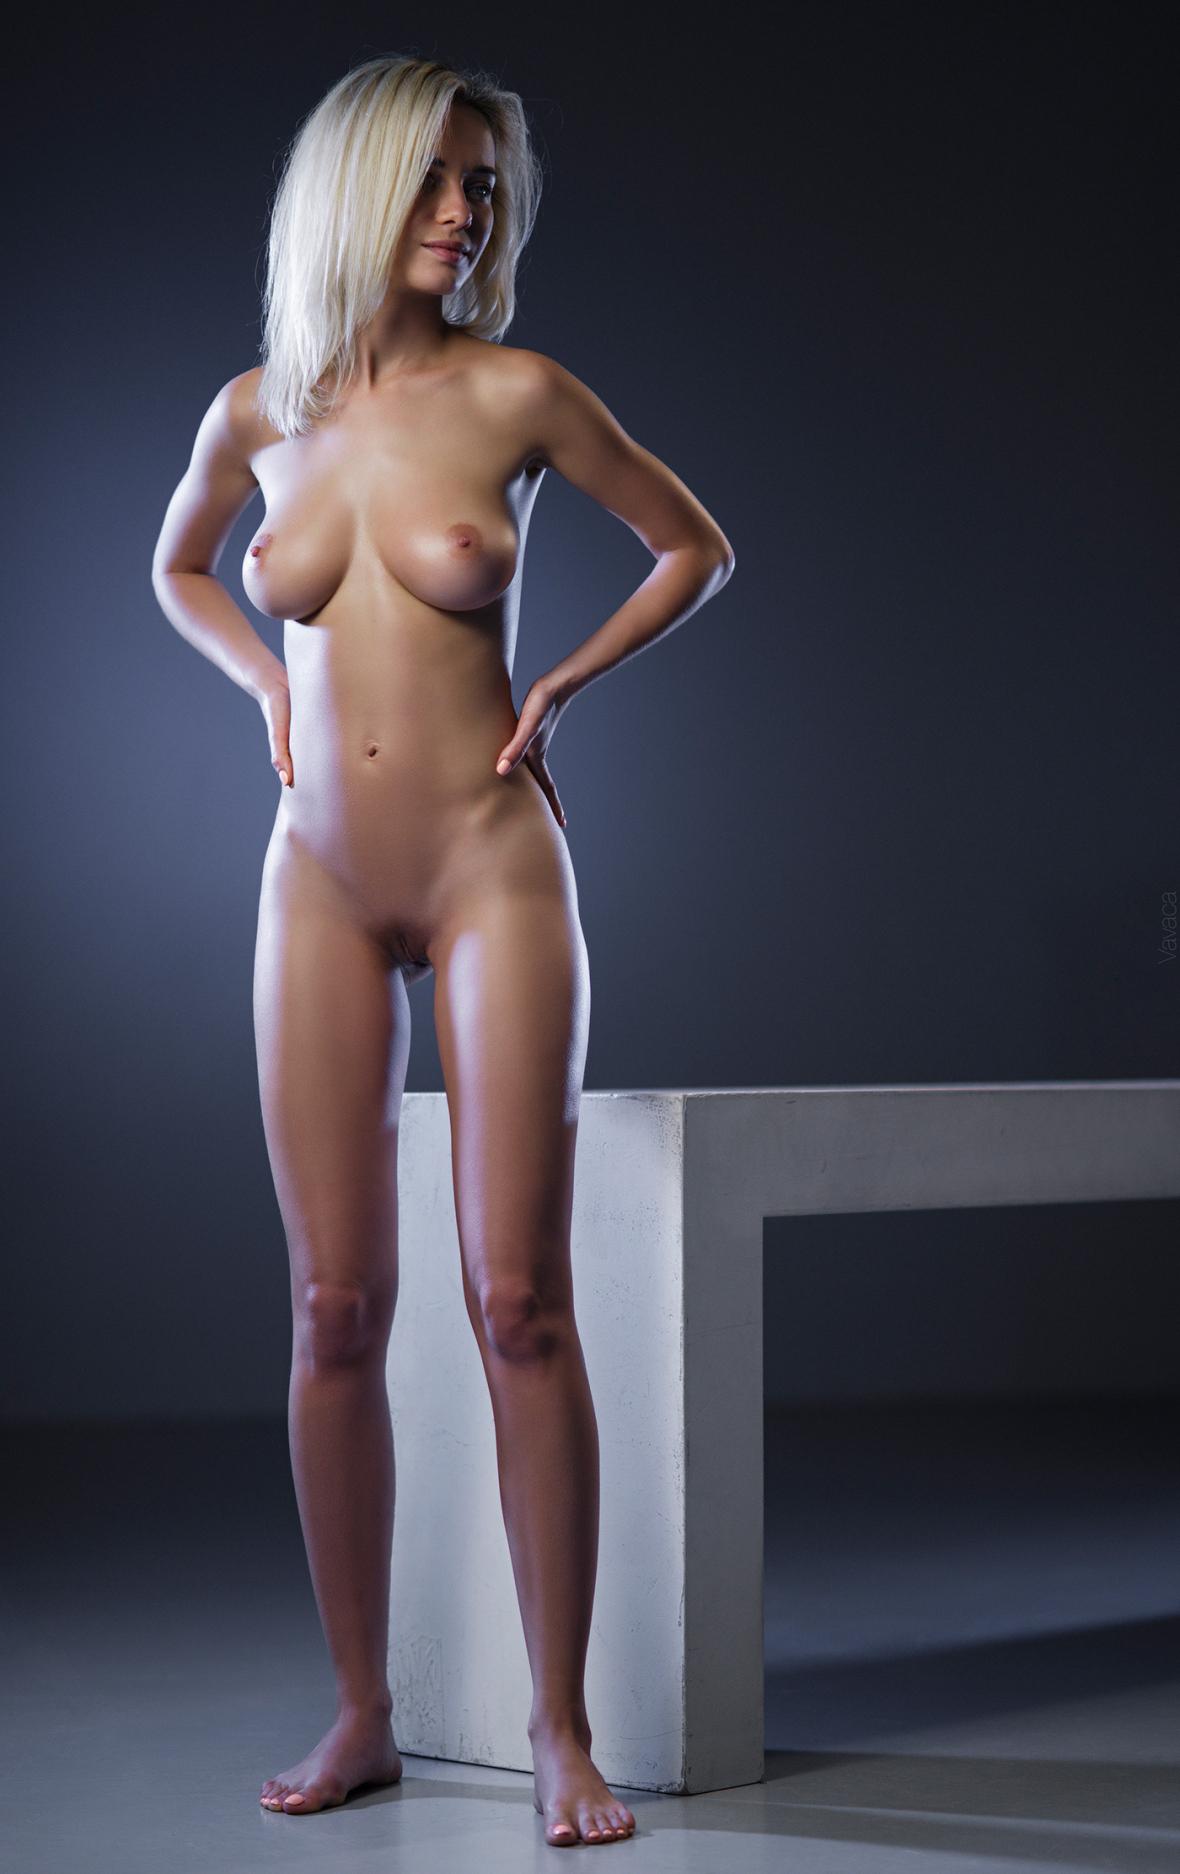 Natali Andreeva - Vladimir Nikolaev photoshoot